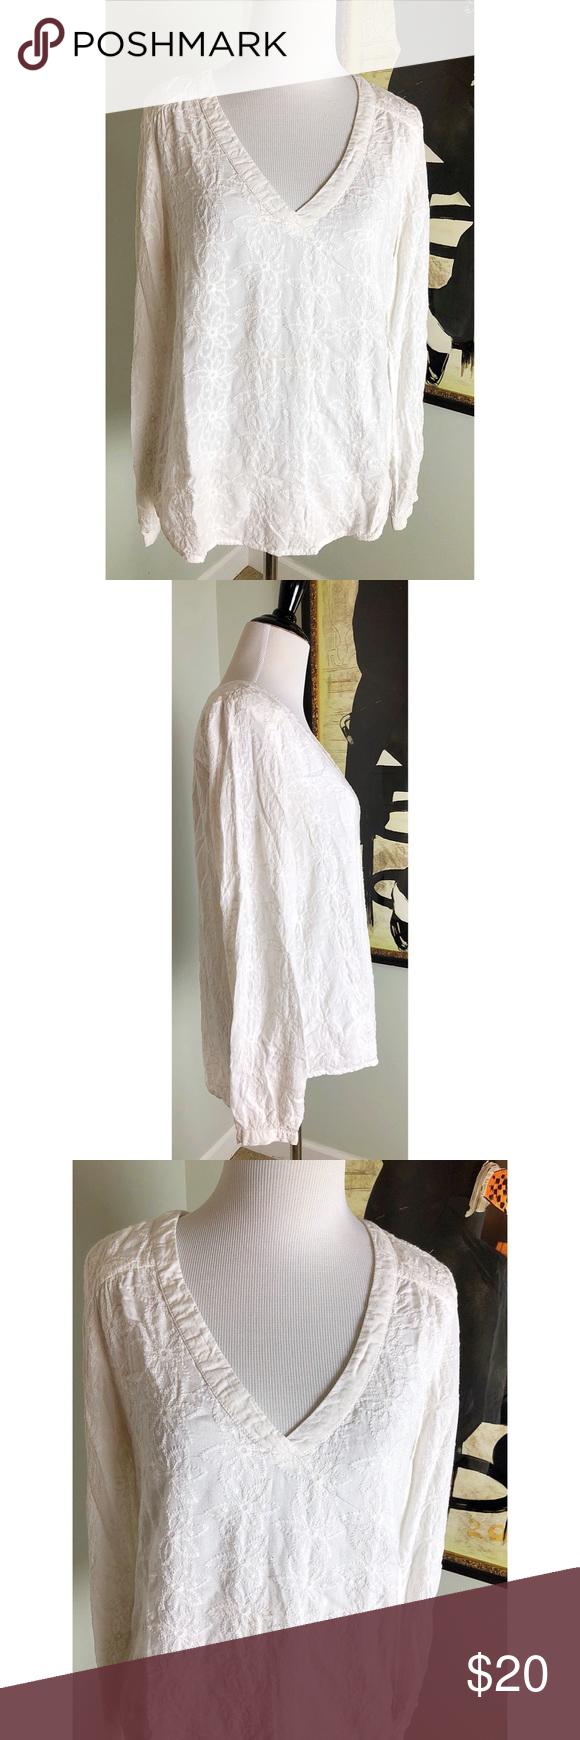 H&m lace dress white  HuM LOGG Flower Stitched Tunic Size   Flower lights Tunics and